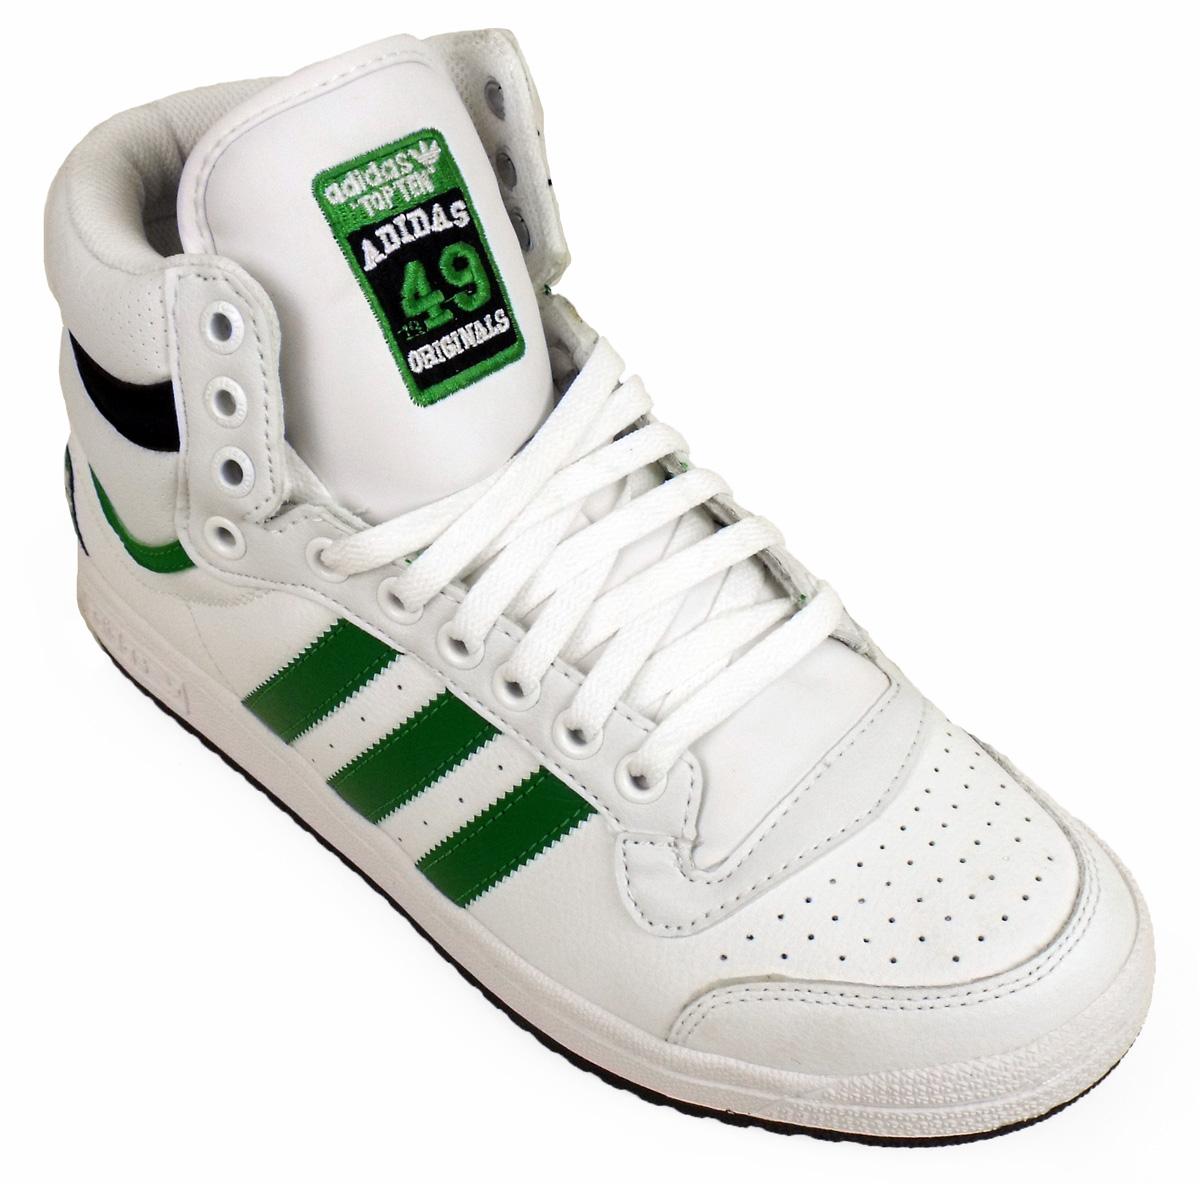 mens adidas top ten hi tops basketball boot trainers ankle skate shoe trainer ebay. Black Bedroom Furniture Sets. Home Design Ideas